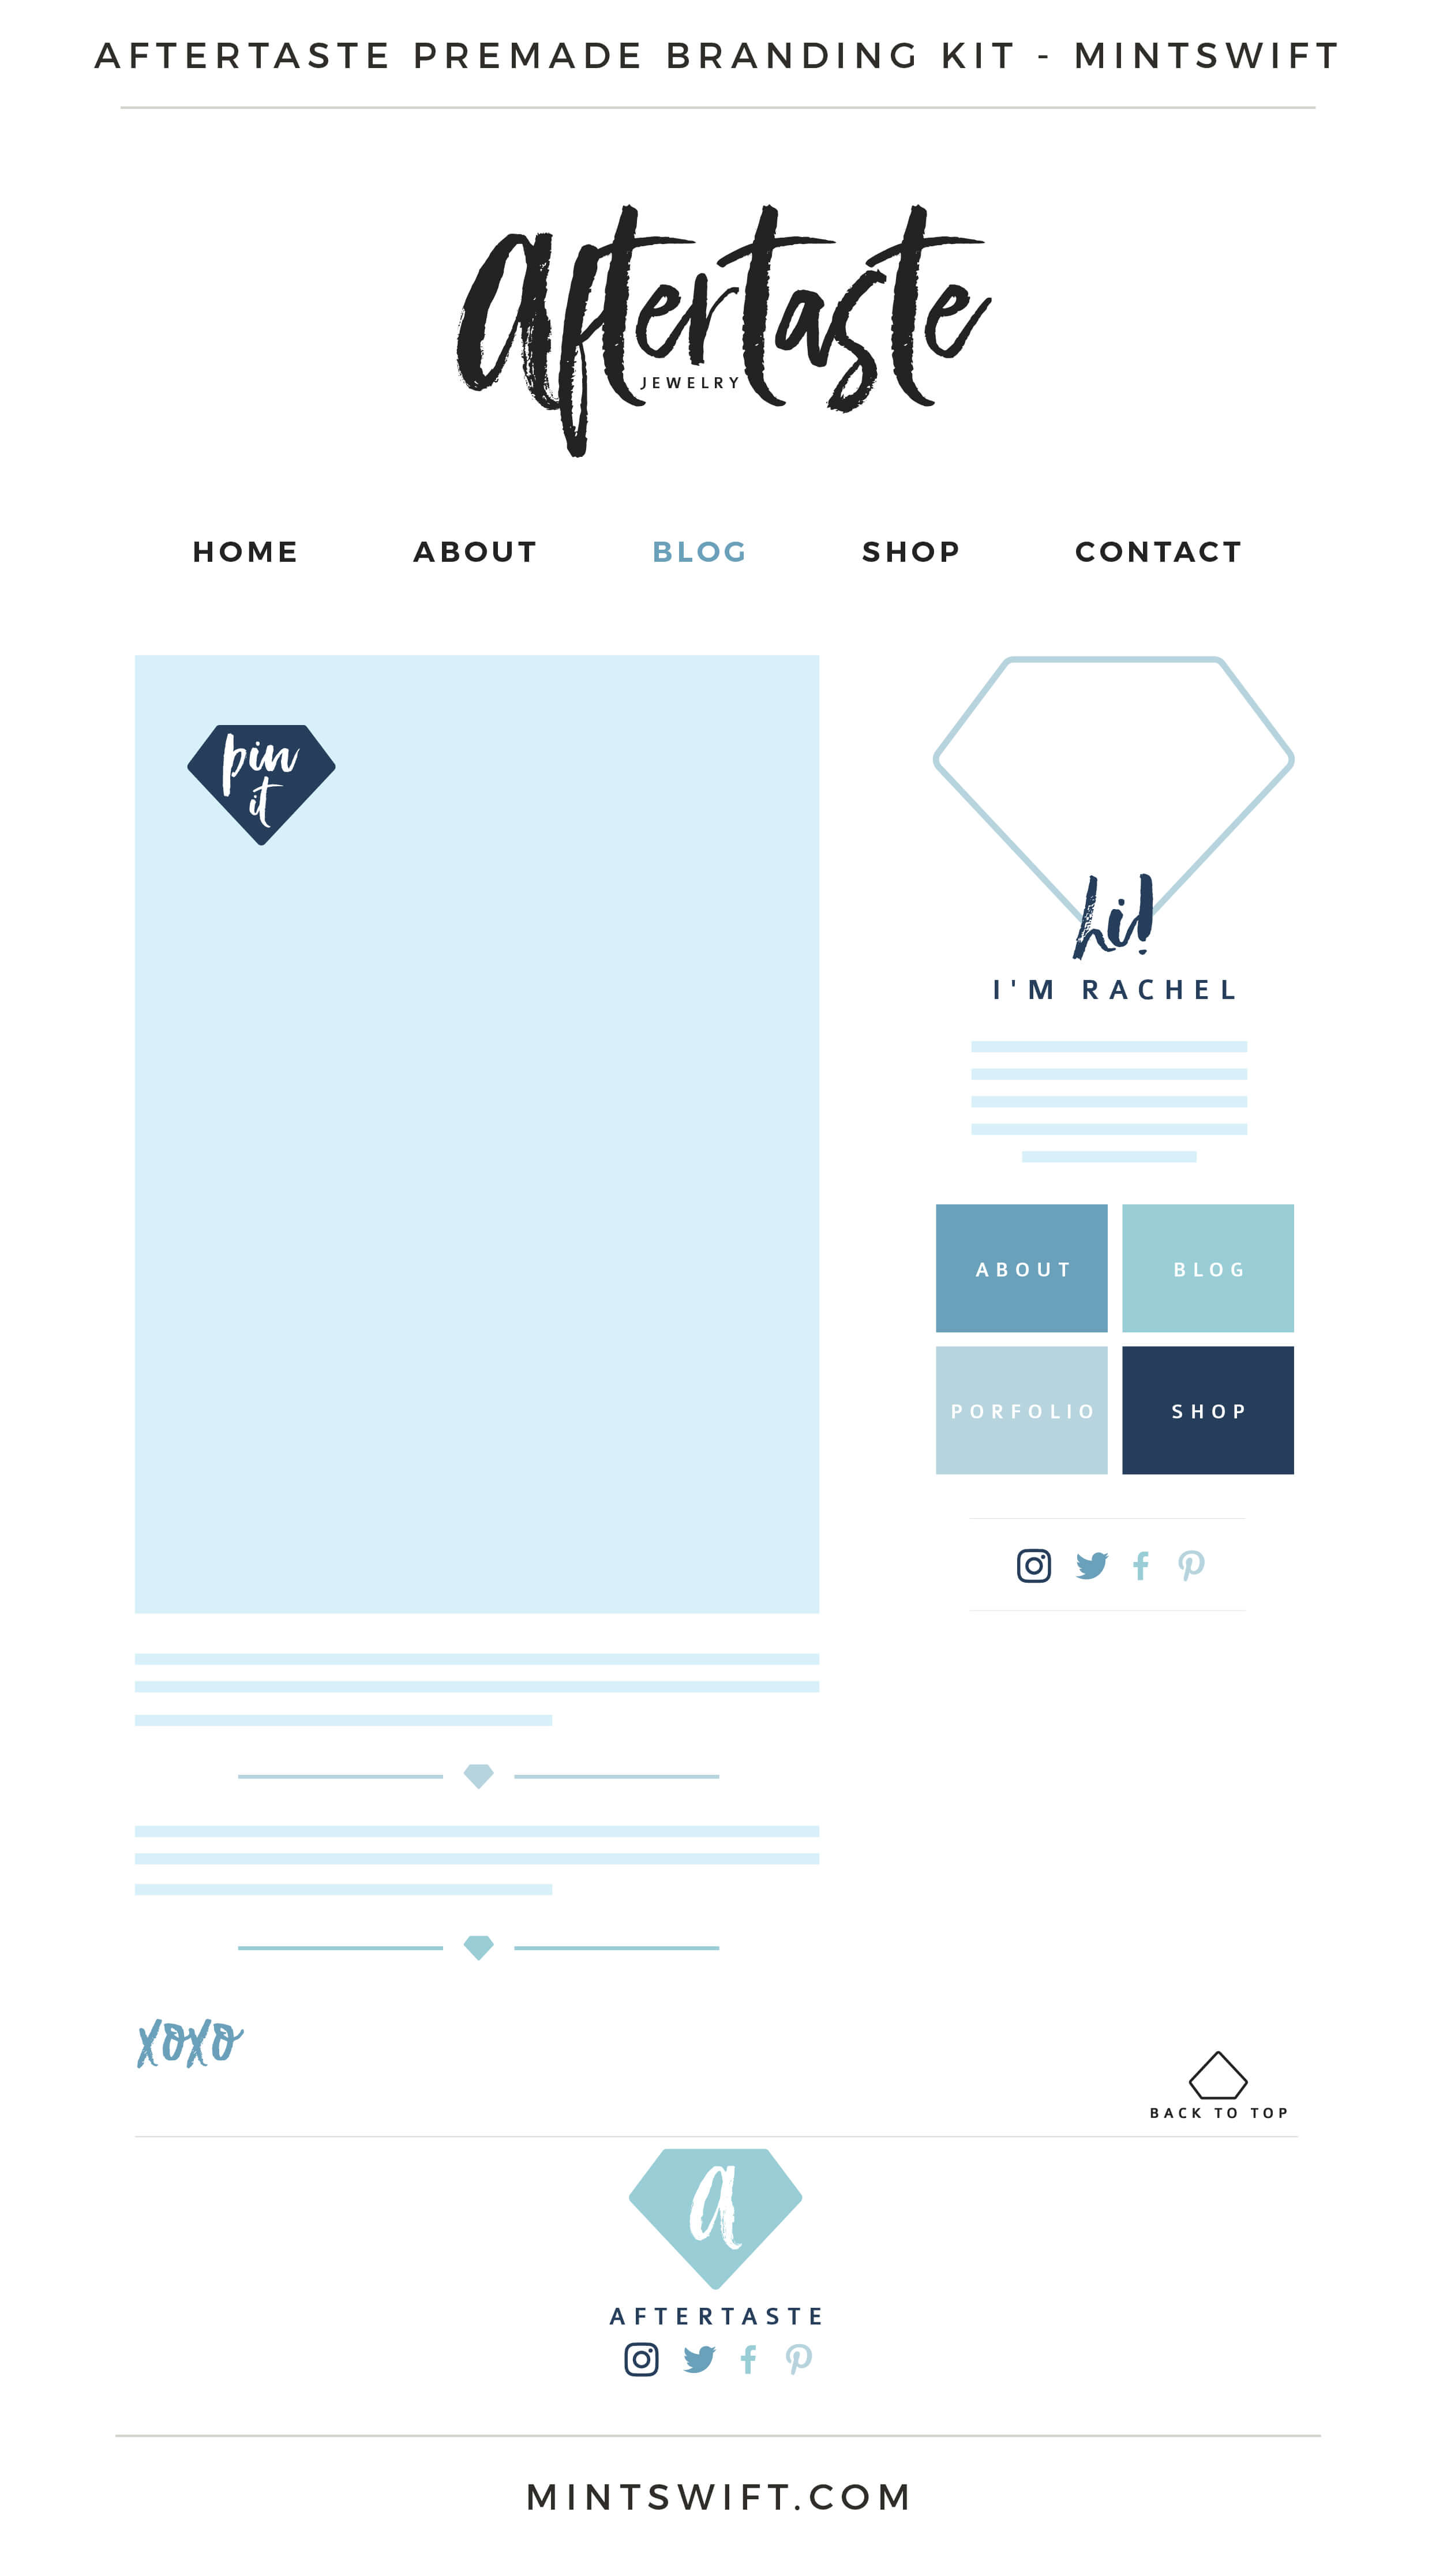 mintswift shop redesigned premade branding kits u0026 logos now